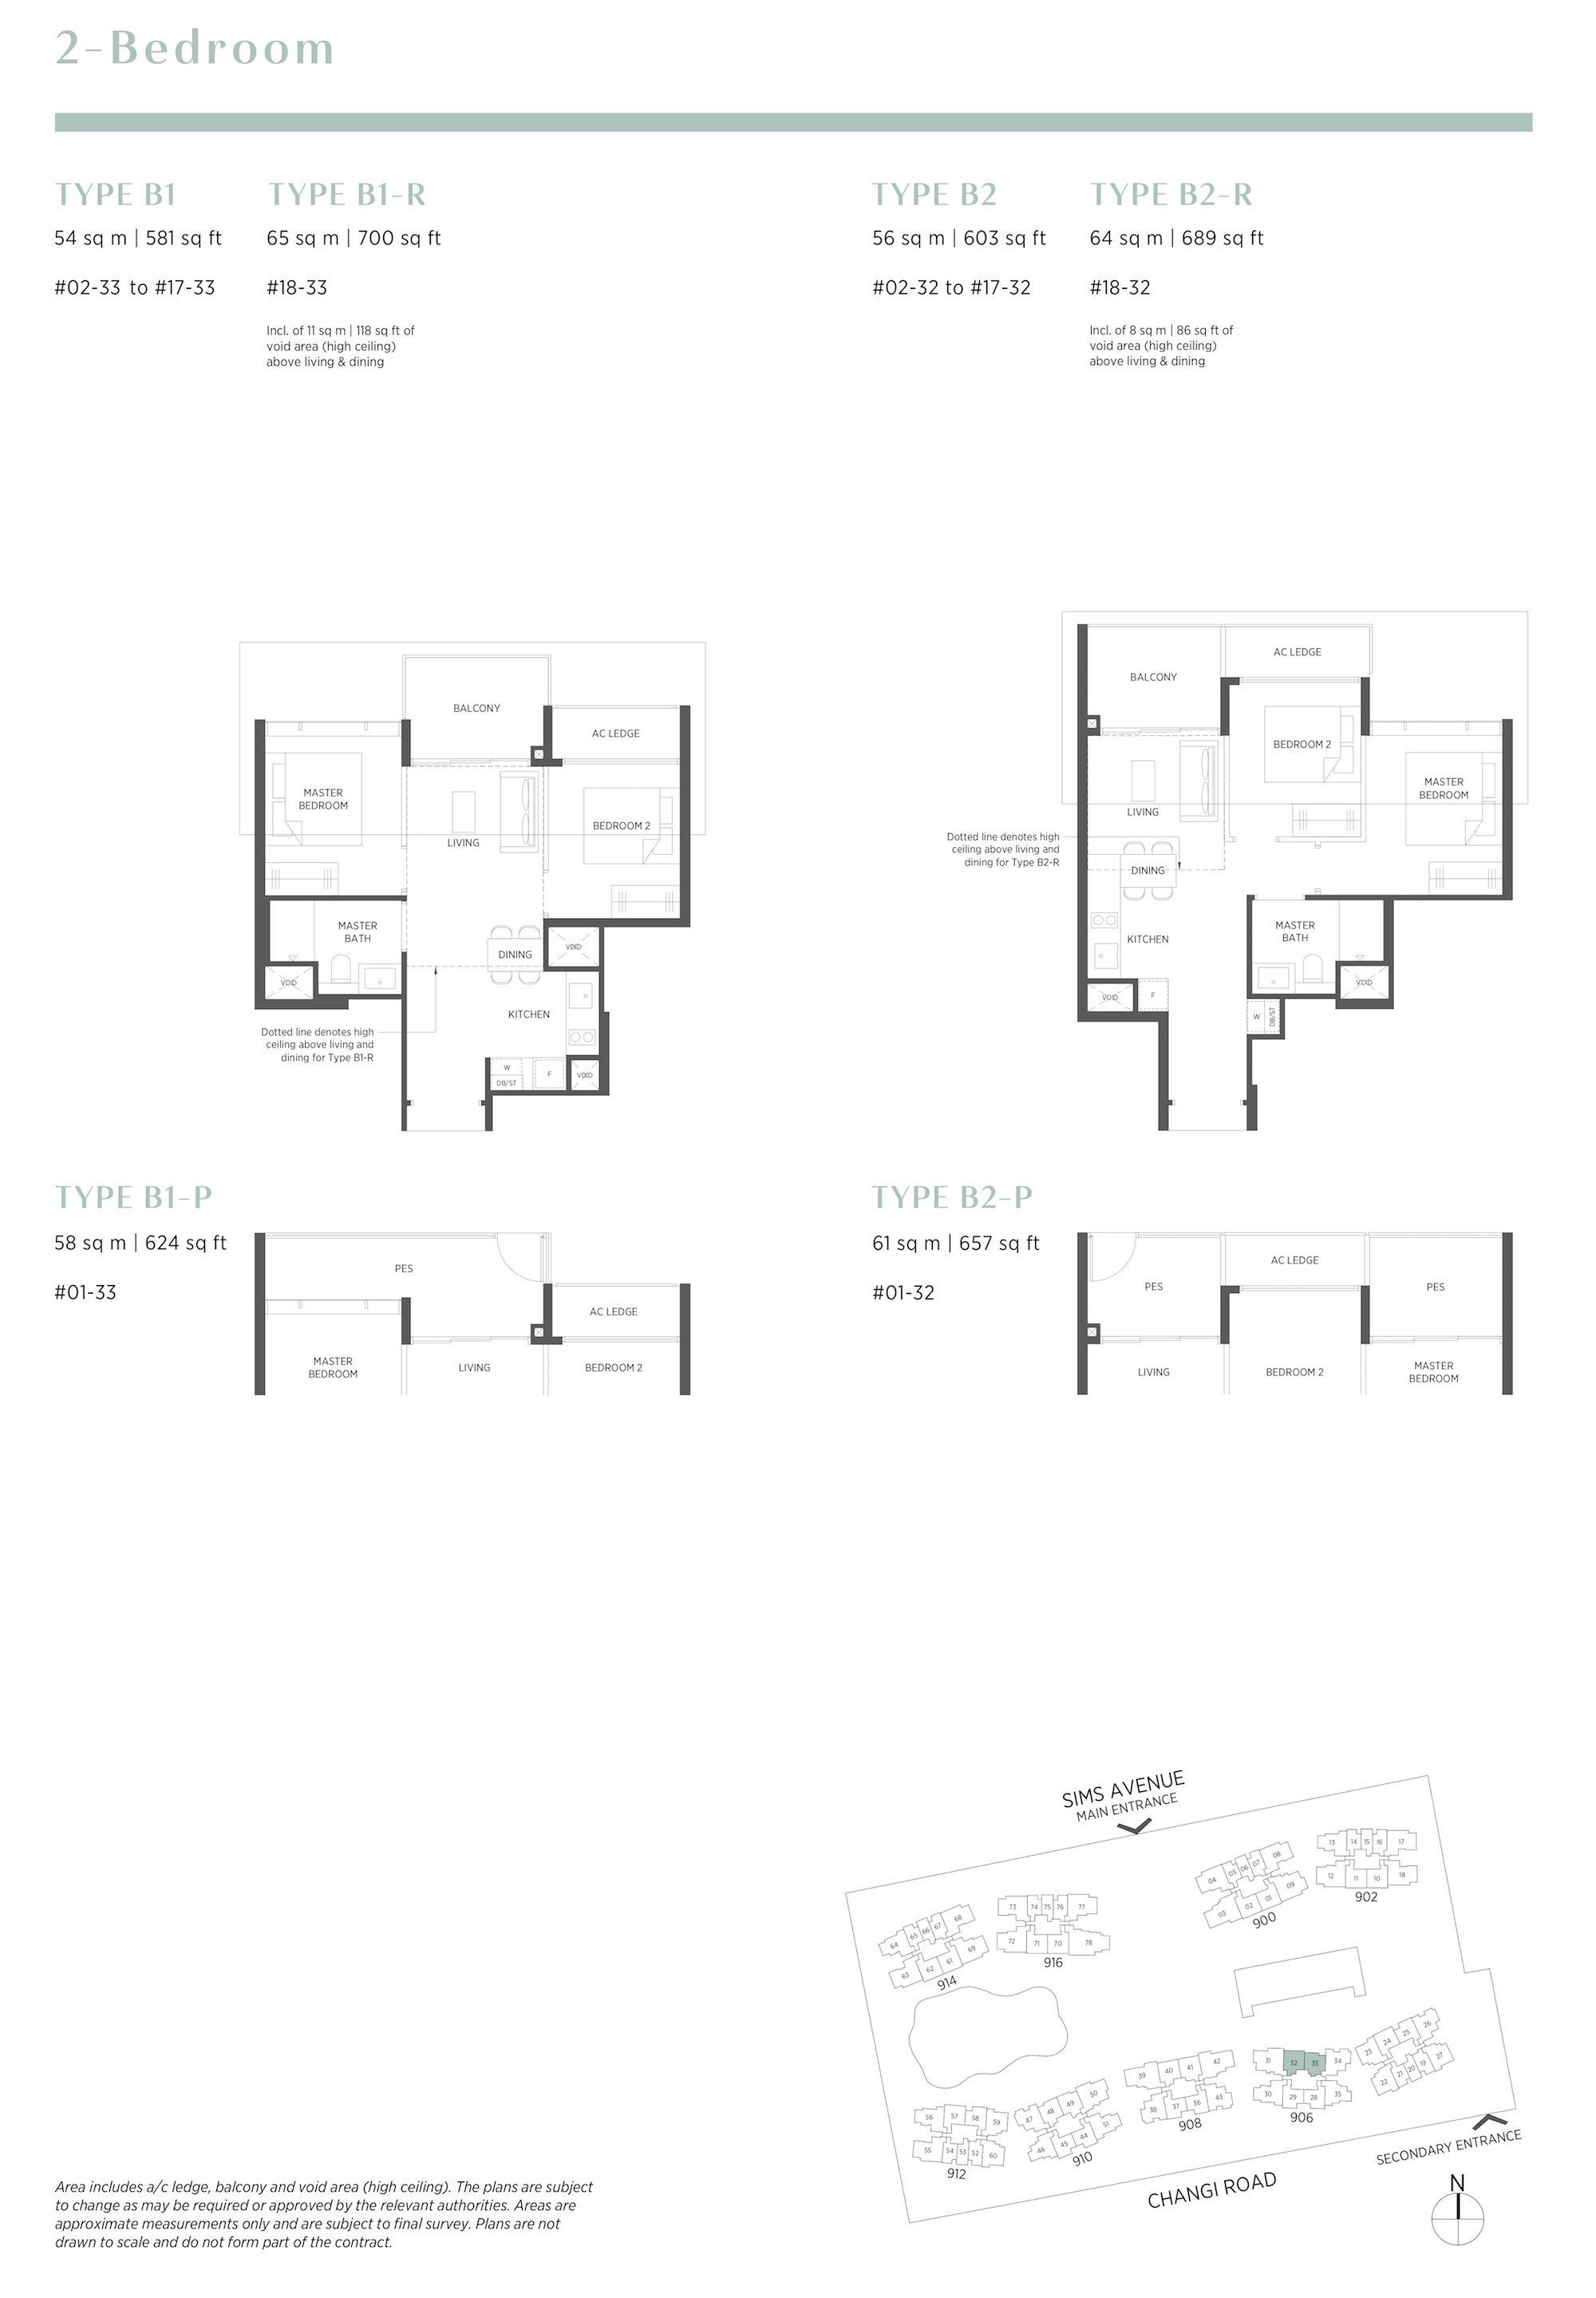 Parc Esta 东景苑 2 bedroom 2卧房 B1 B2